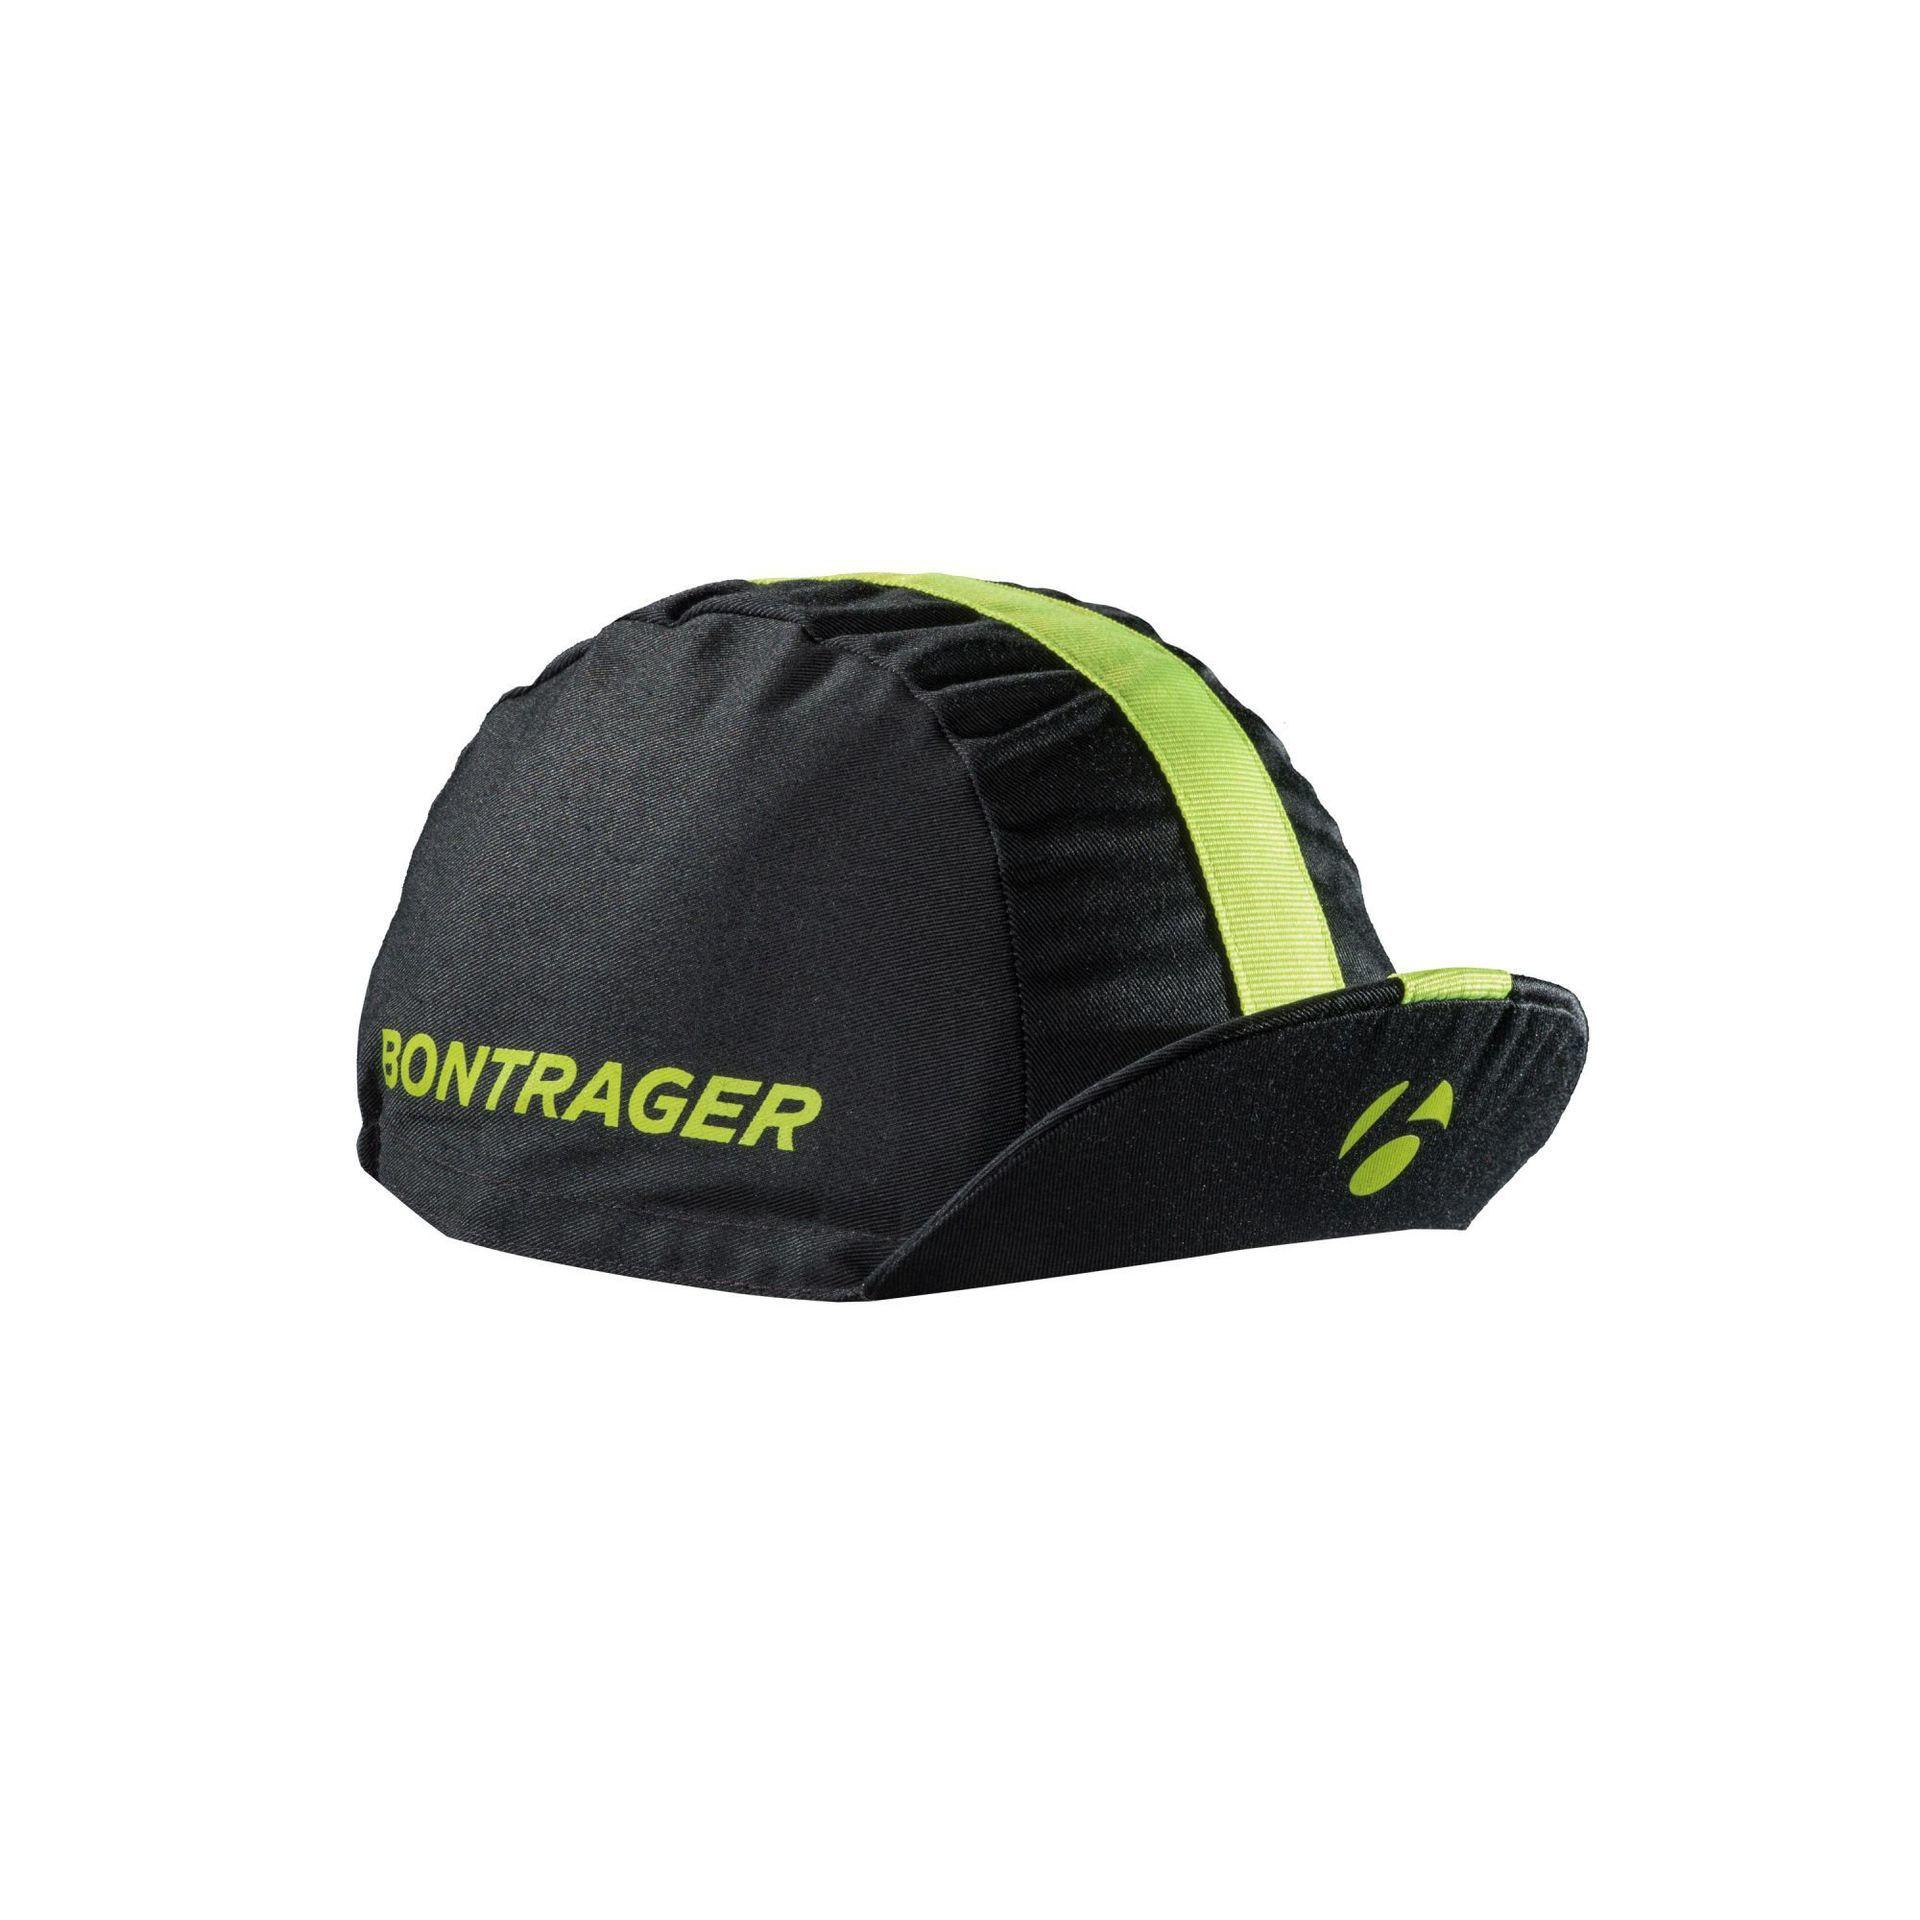 CZAPKA POD KASK BONTRAGER CYCLING CAP 3